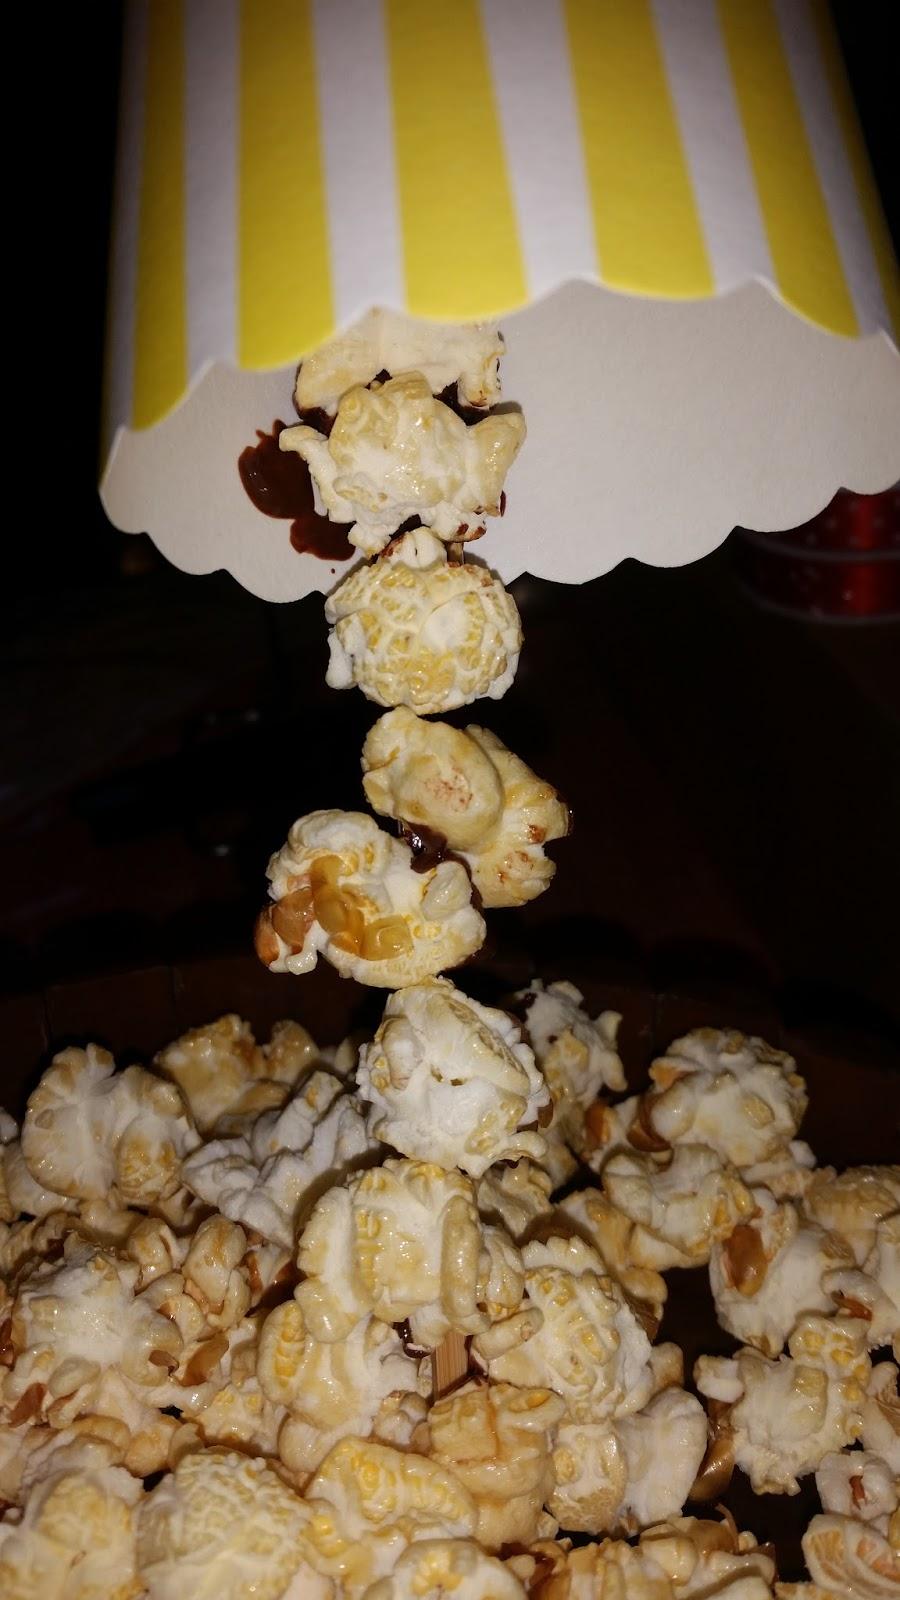 Sandy S Kitchendreams Popcorn Kuchen